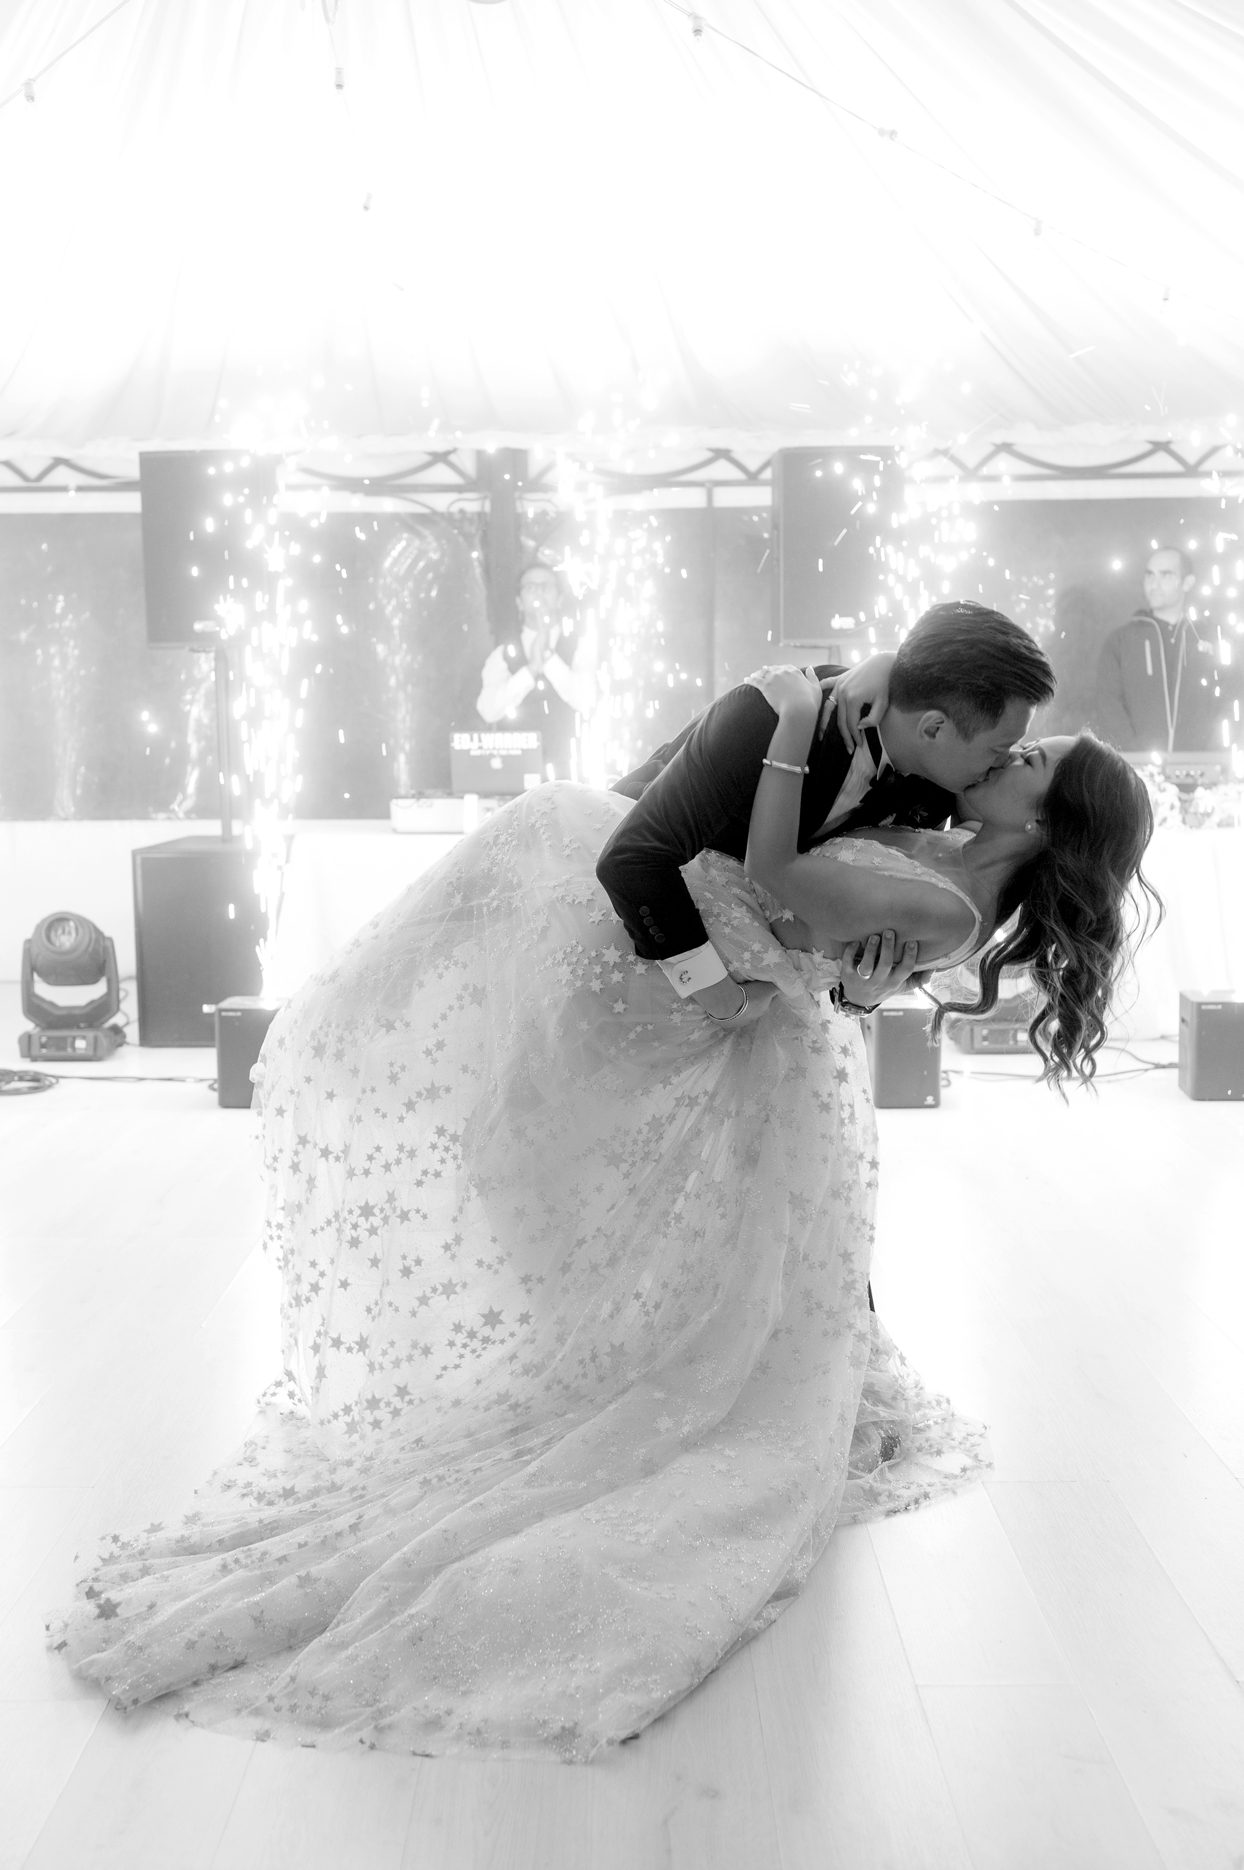 groom dips bride during first dance with sparkler backdrop